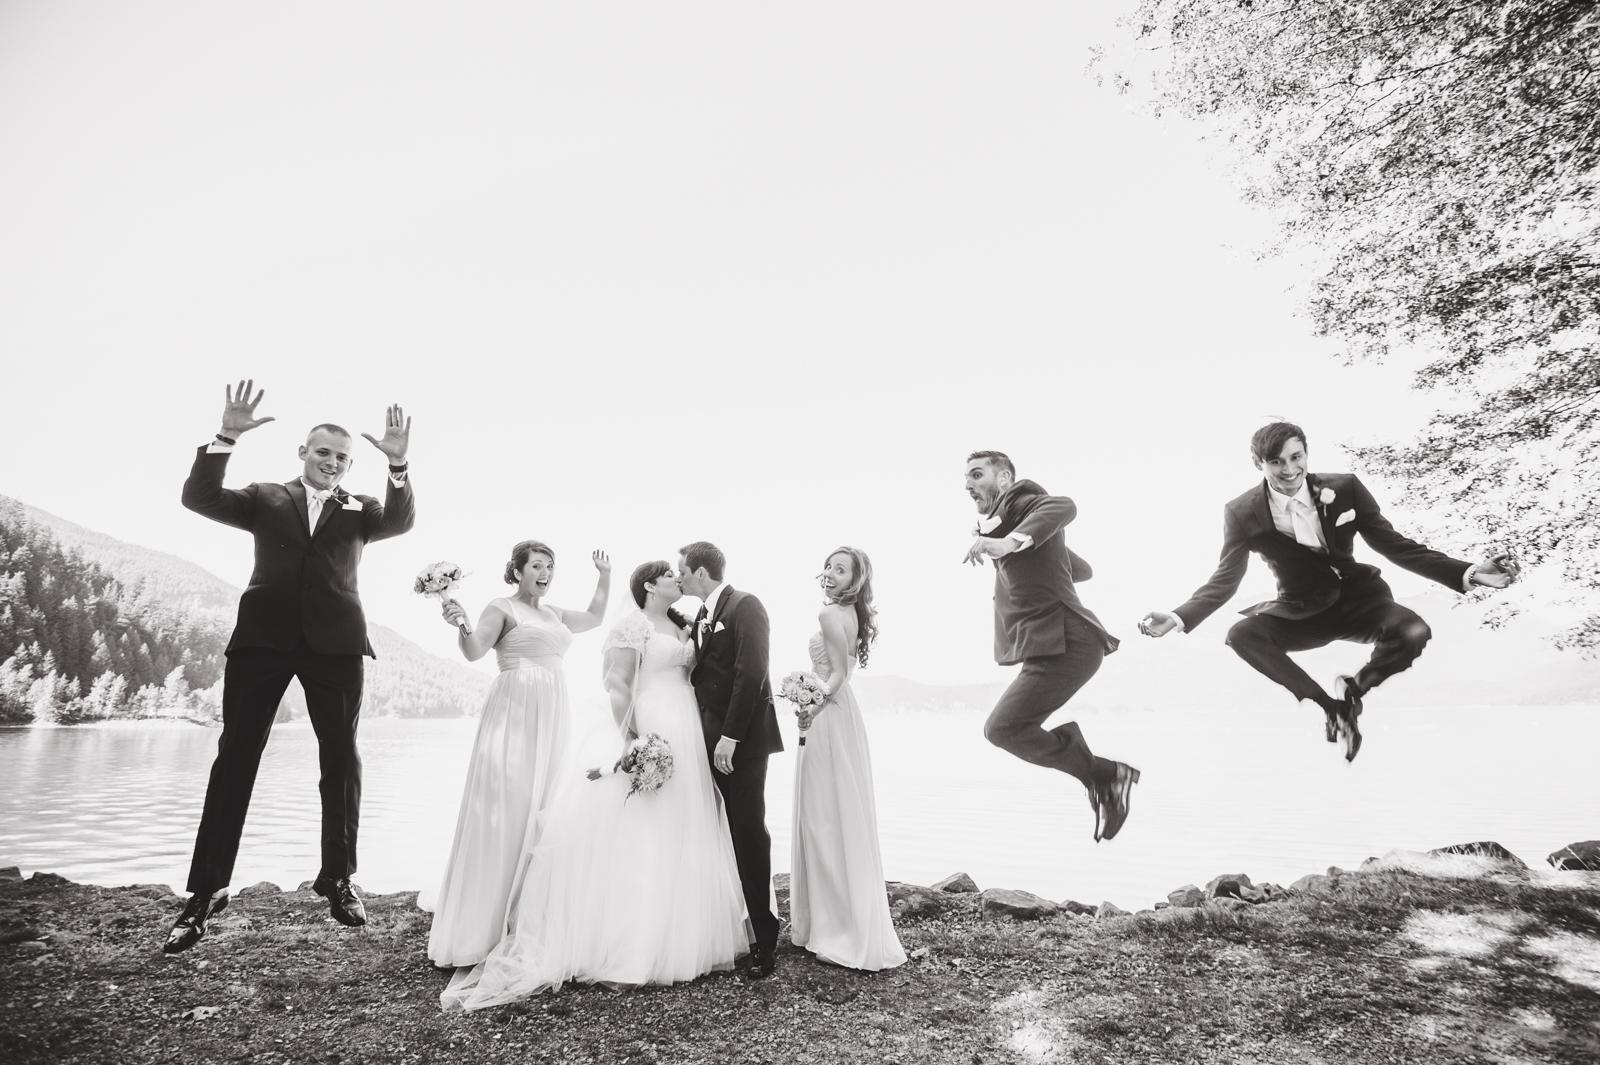 bc-wedding-photographers-harrison-lake-wedding-37.jpg